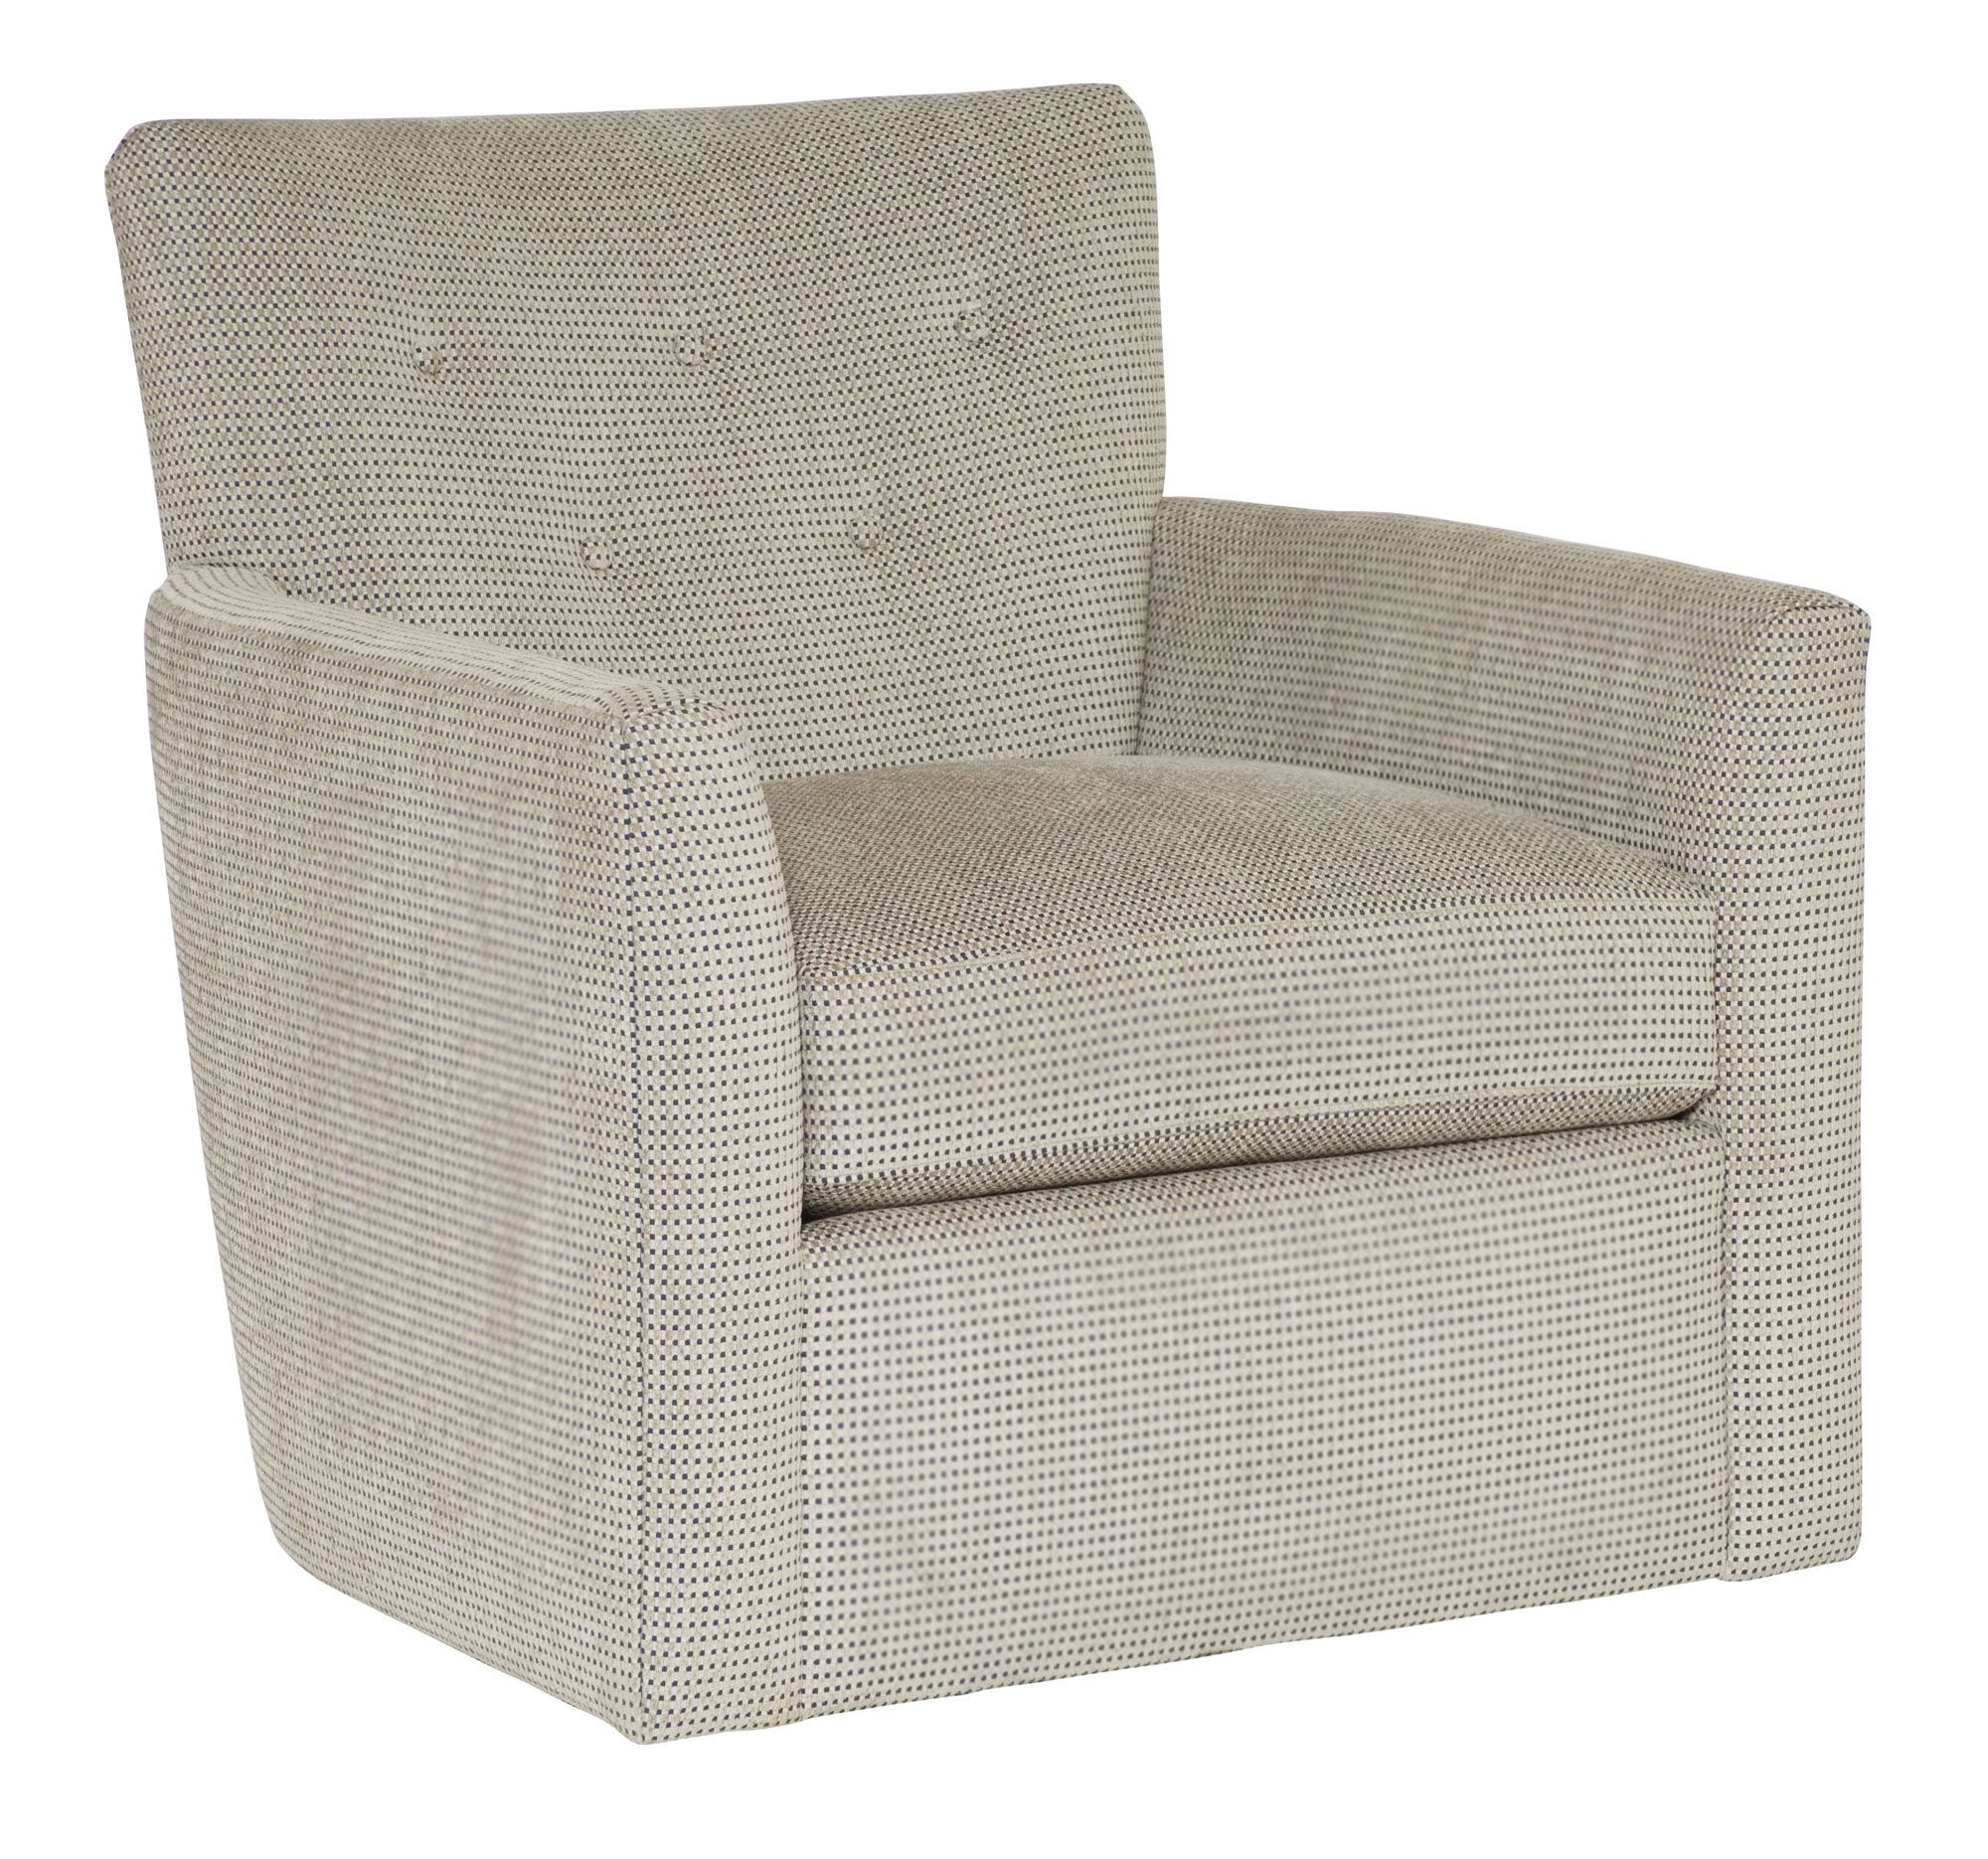 Swivel Chair Bernhardt Swivel chair, Modern swivel